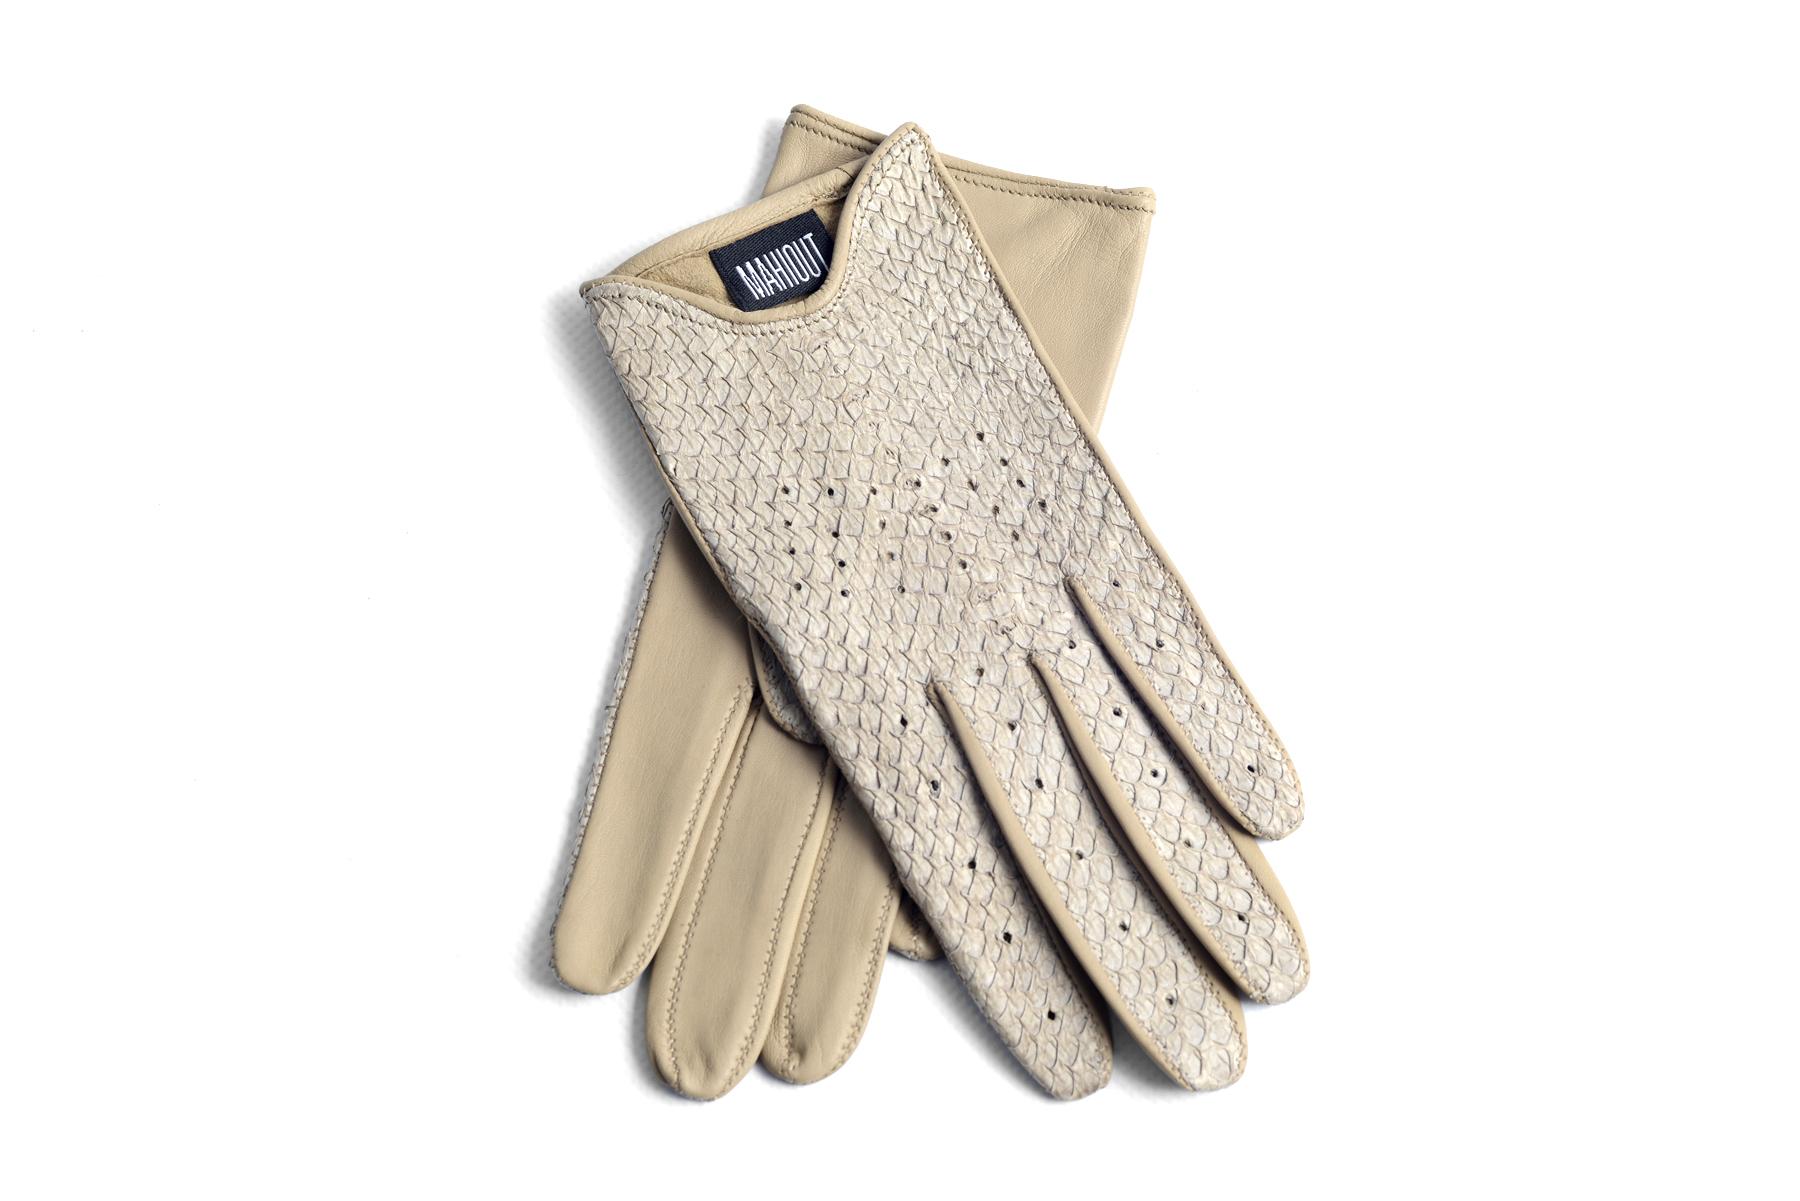 Mahiout Jackie gloves in salmon skin